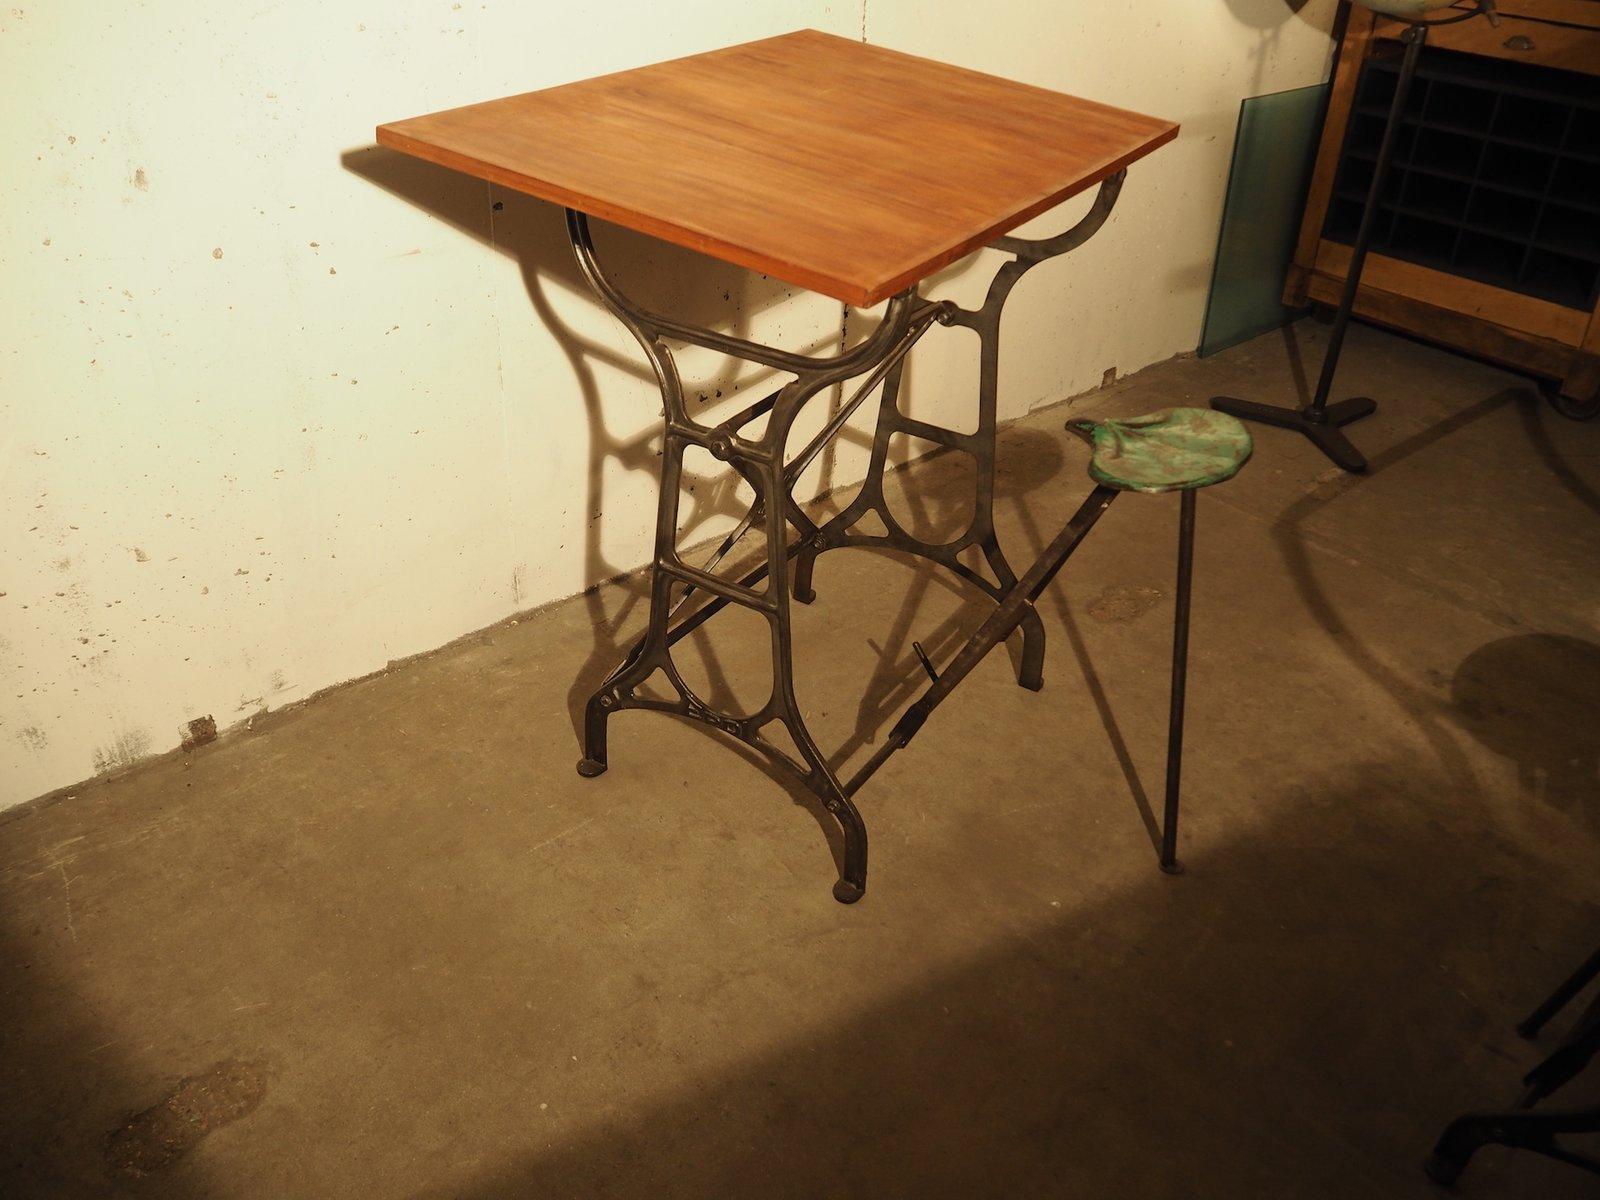 Table A Dessin Industriel table de dessin industrielle de epdi, 1940s en vente sur pamono